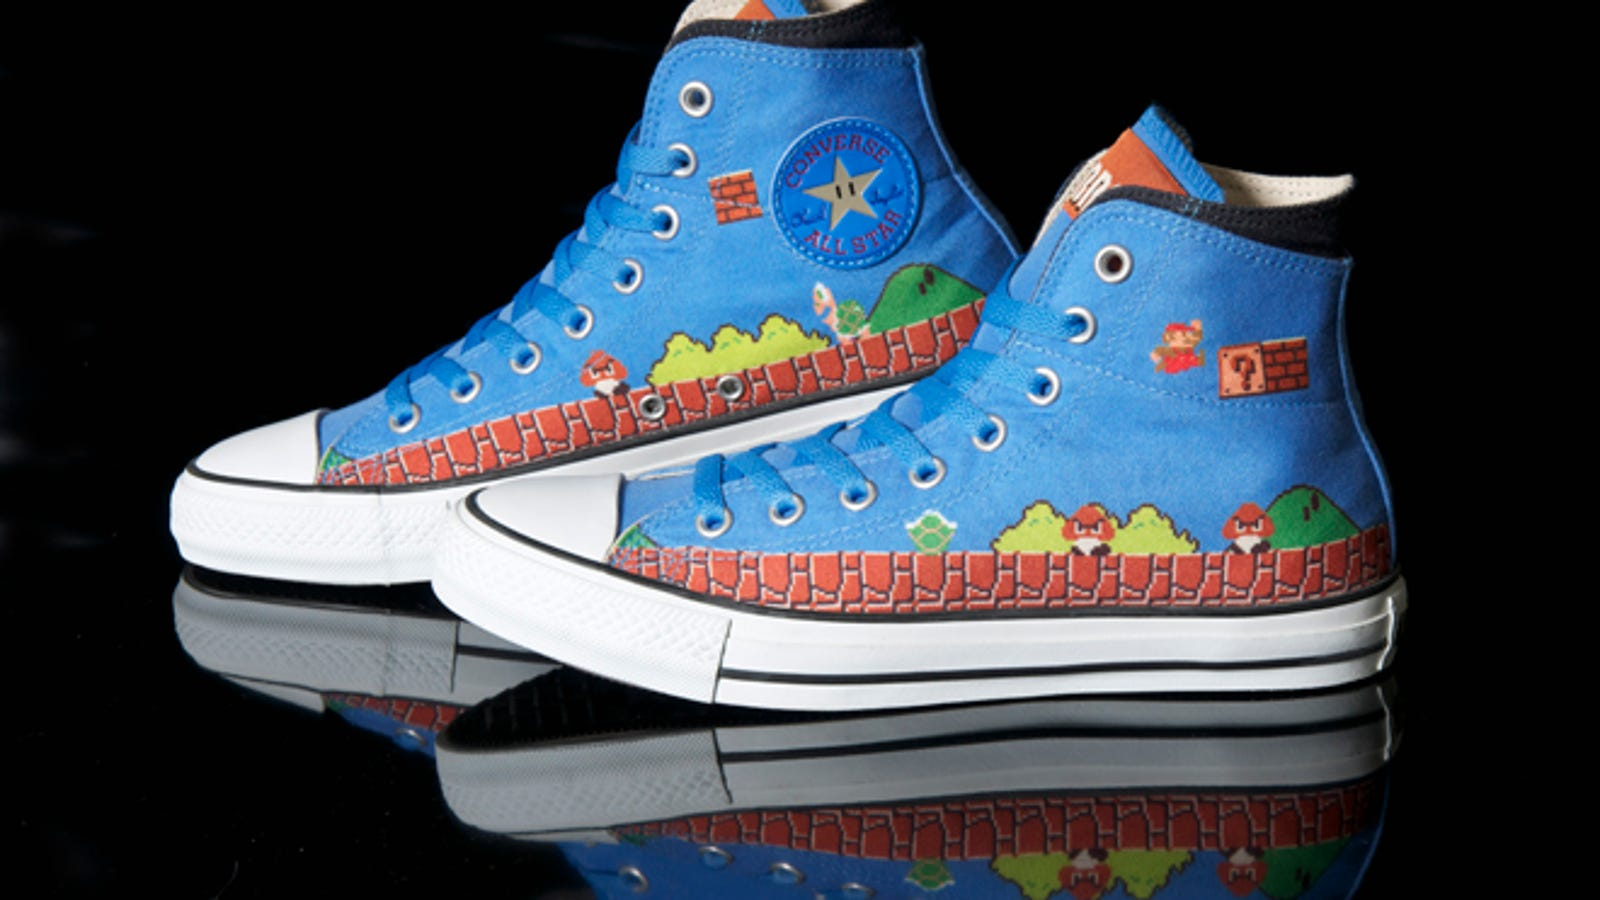 acef3c4822c6b4 Get A Good Look at Converse s Beautiful Super Mario Bros. Sneakers